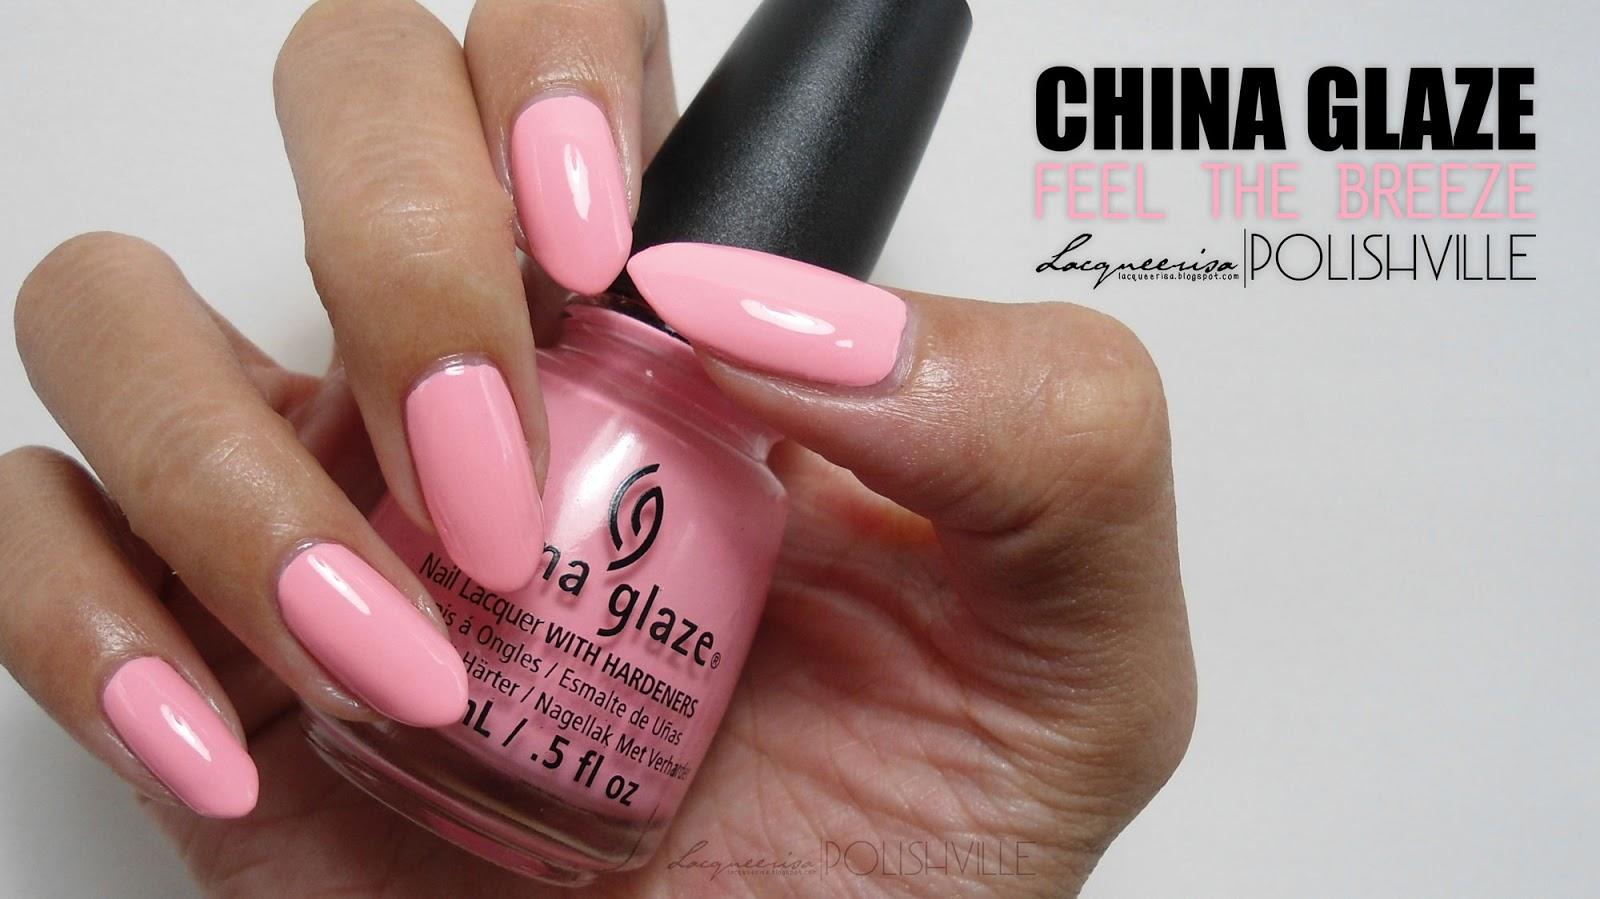 LacqueerisaXPolishville: China Glaze, Feel The Breeze